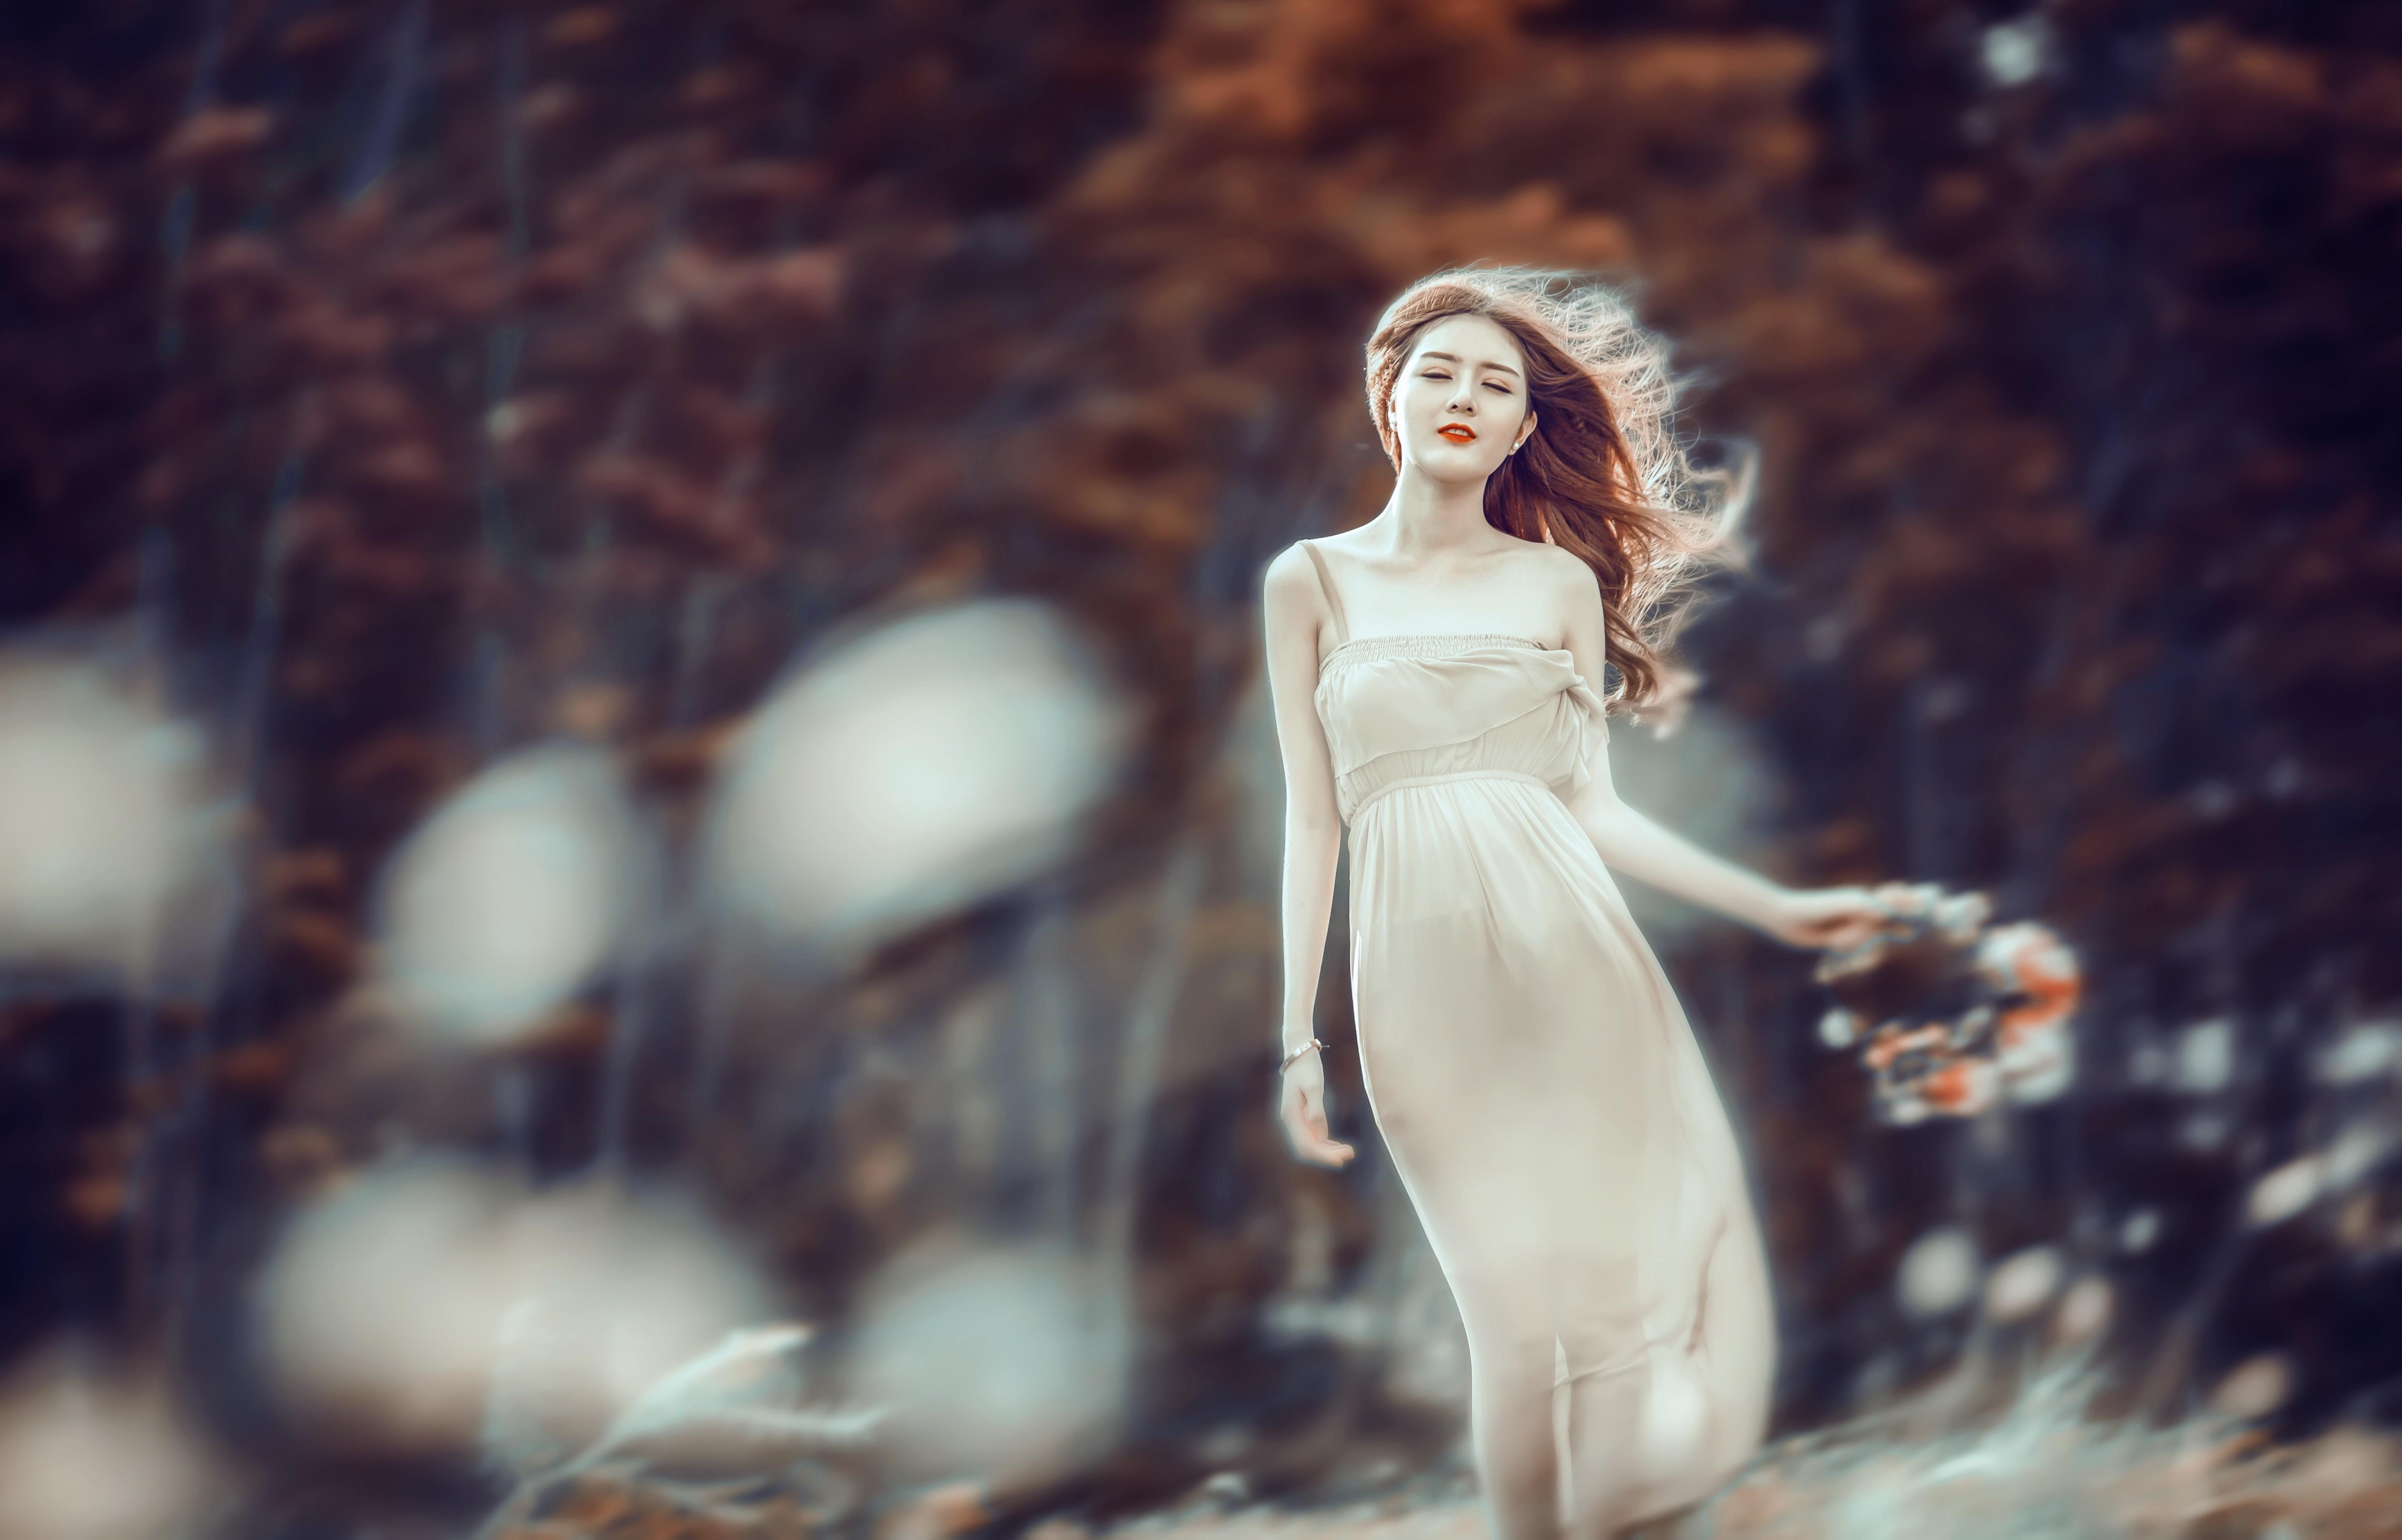 sunlight women outdoors women model Asian angel photography dress statue  fashion spring mythology autumn beauty season